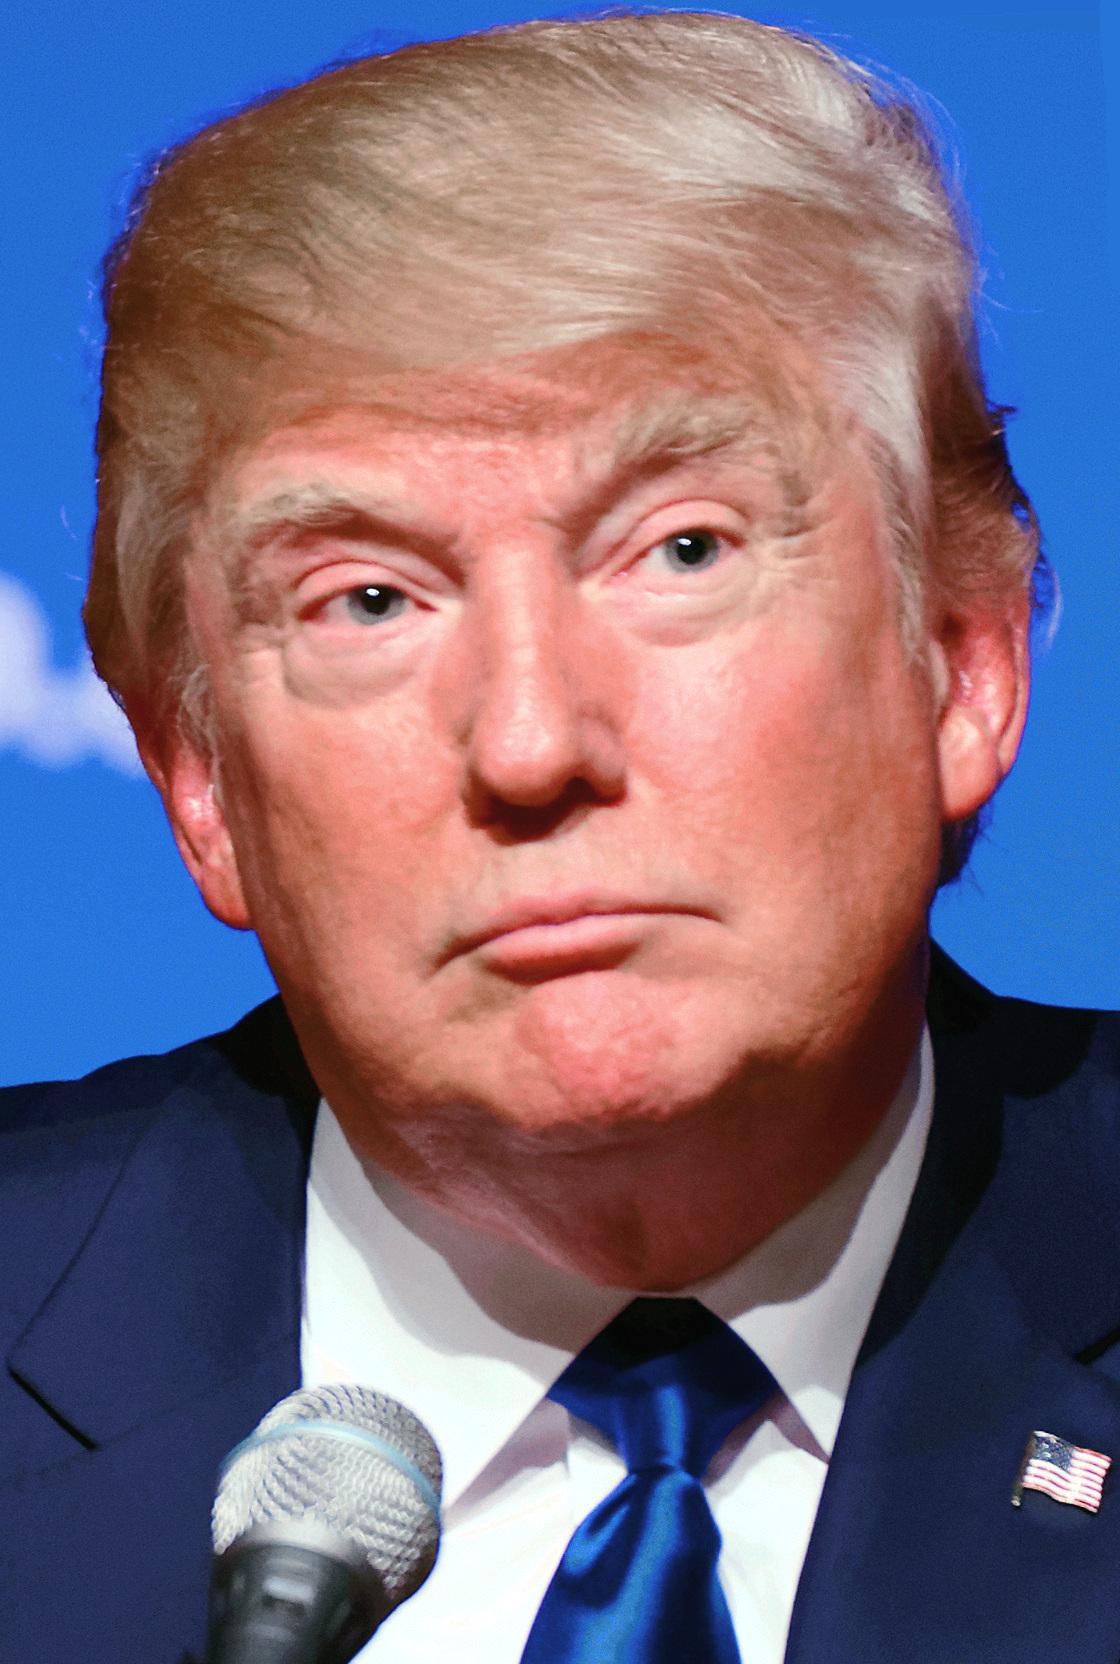 File:Donald Trump August 19 2015.jpg - Wikimedia Commons